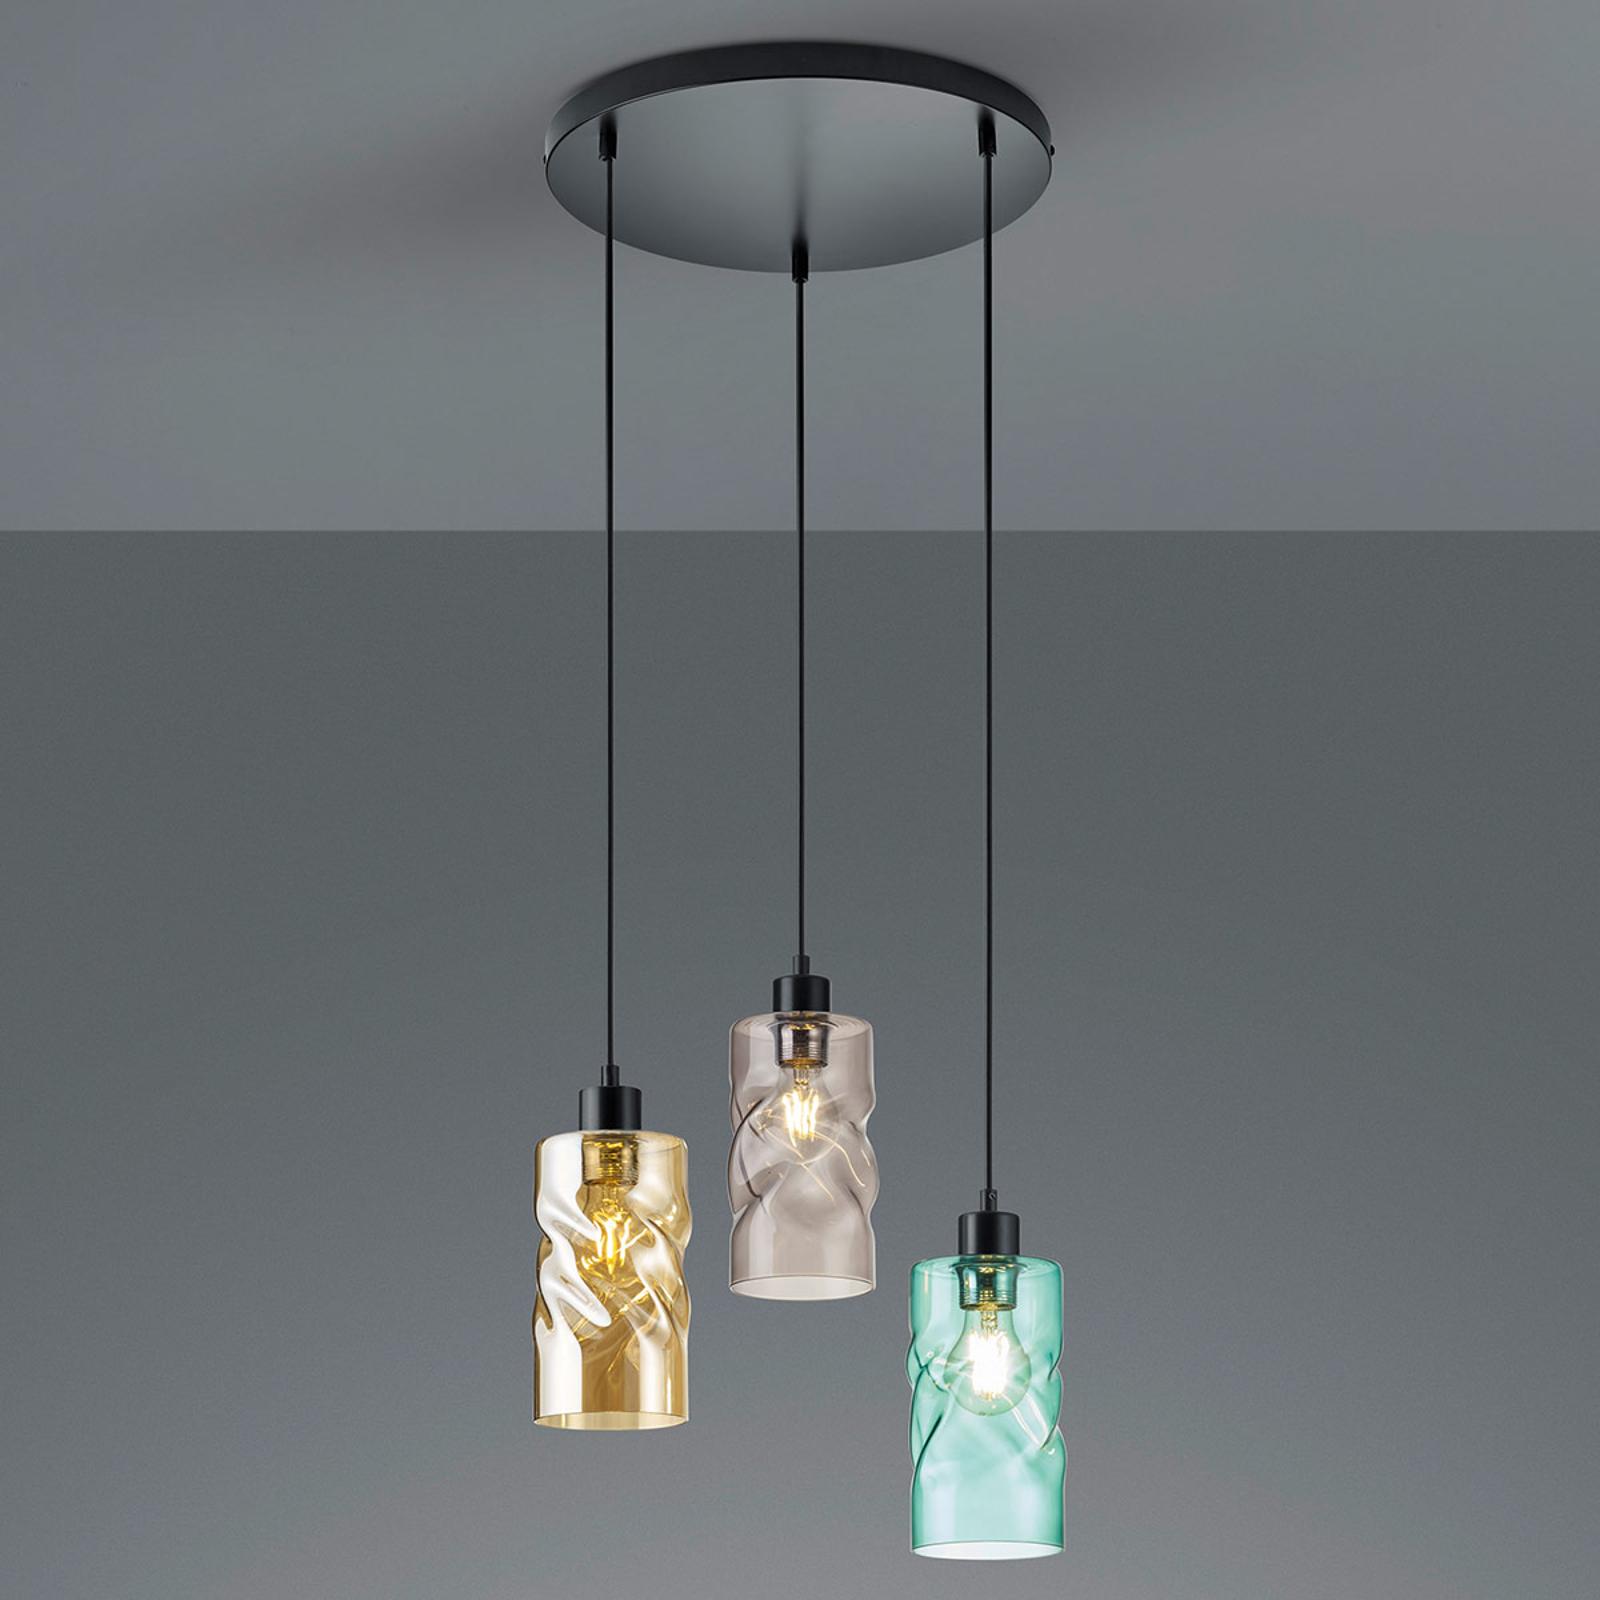 Swirl hængelampe, glasskærme, 3. lyskilder, rund